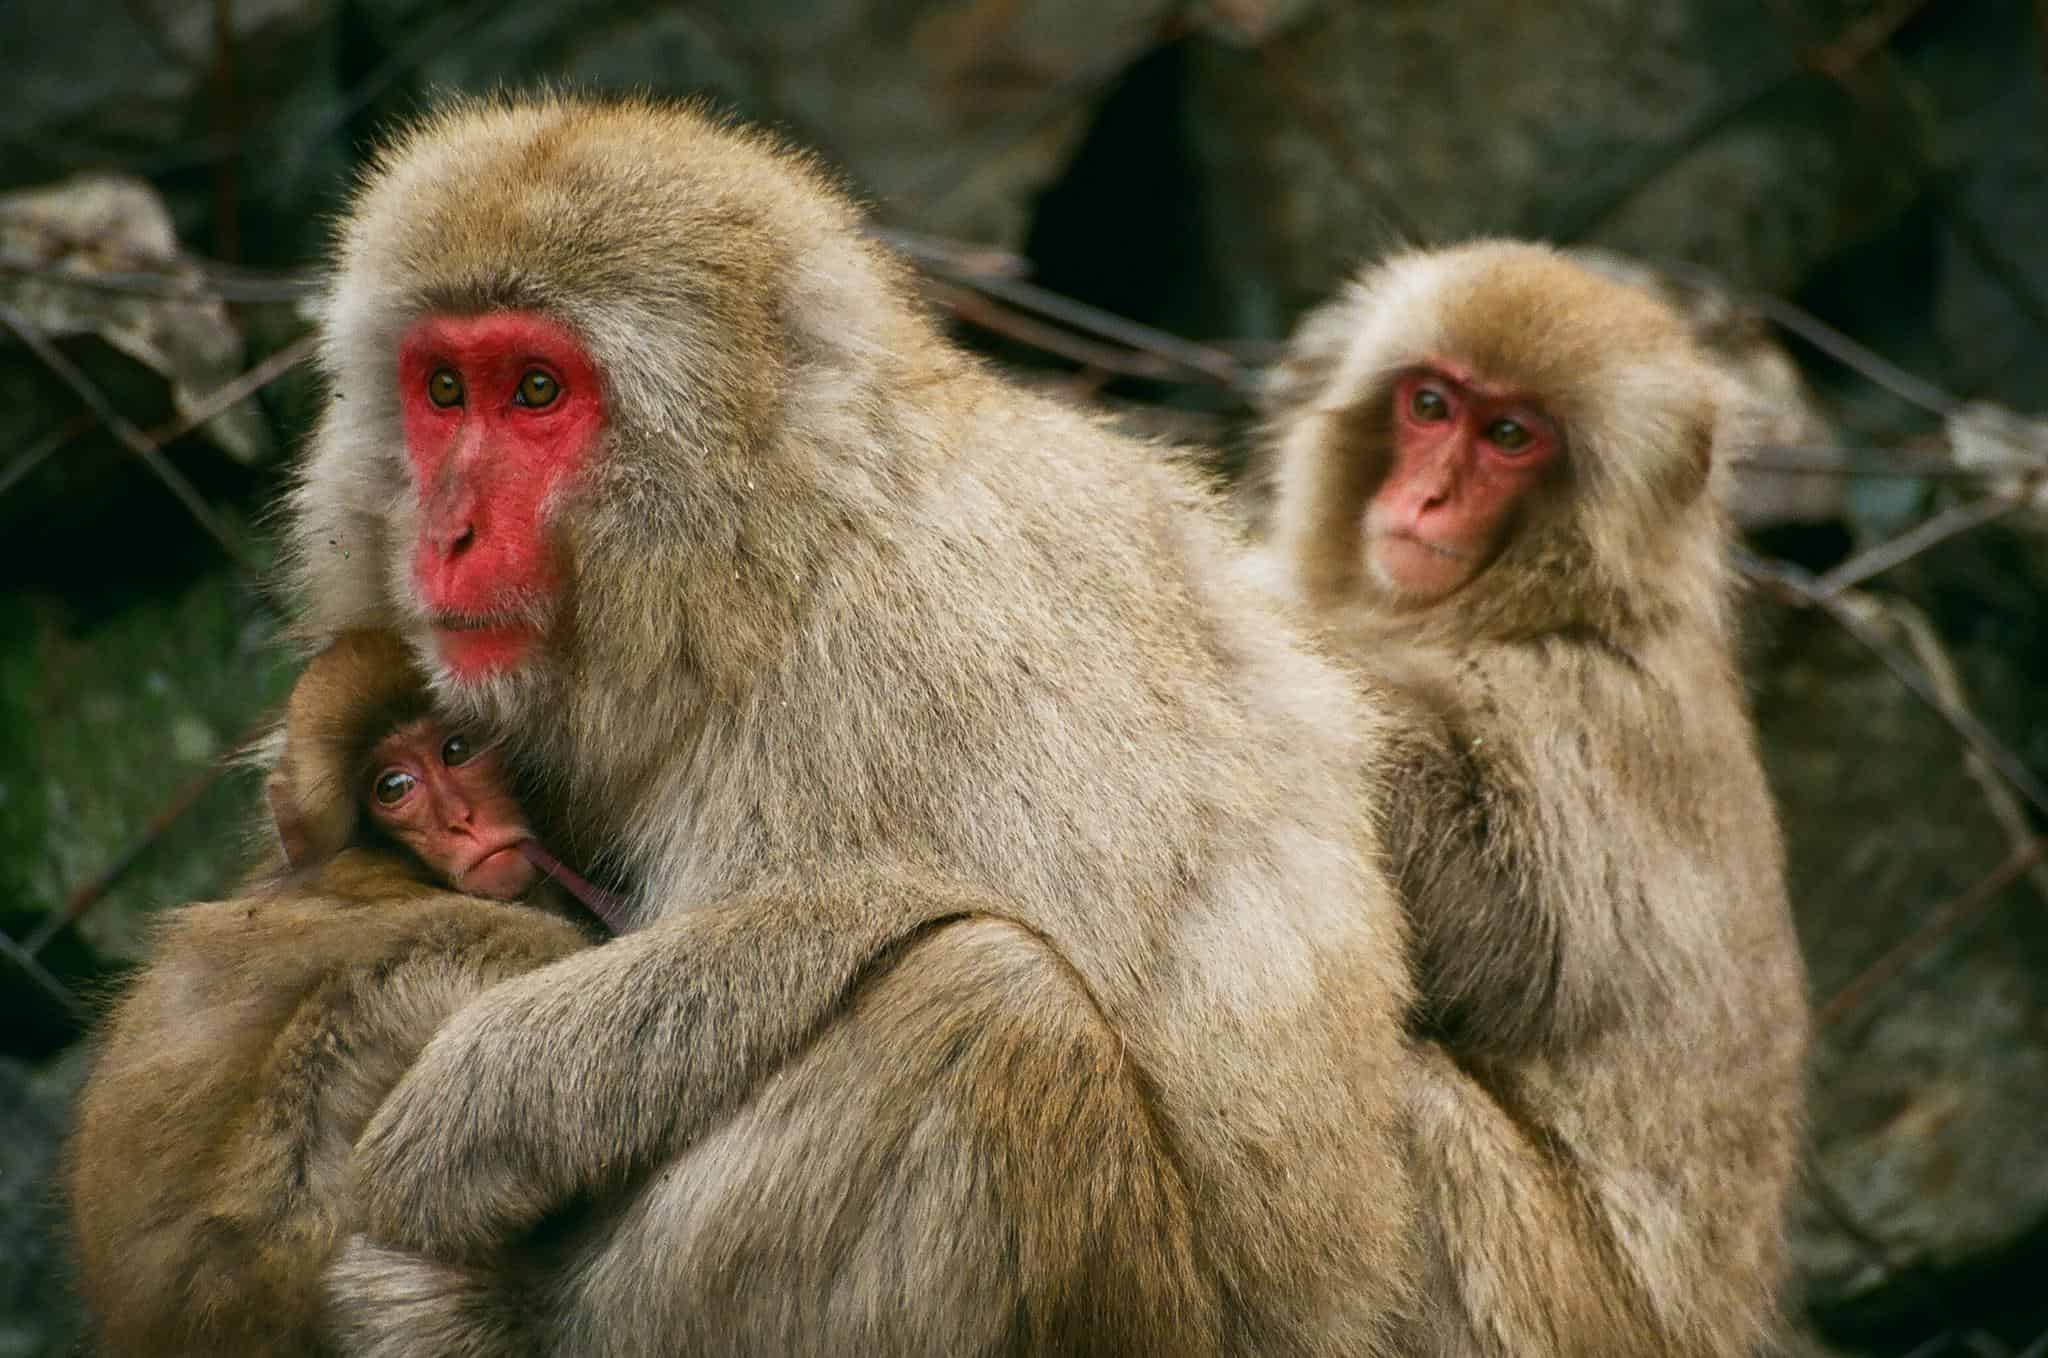 the japanese macaque The japanese macaque this is a video of the japanese macaque taken from the bbc's new life documentary series.